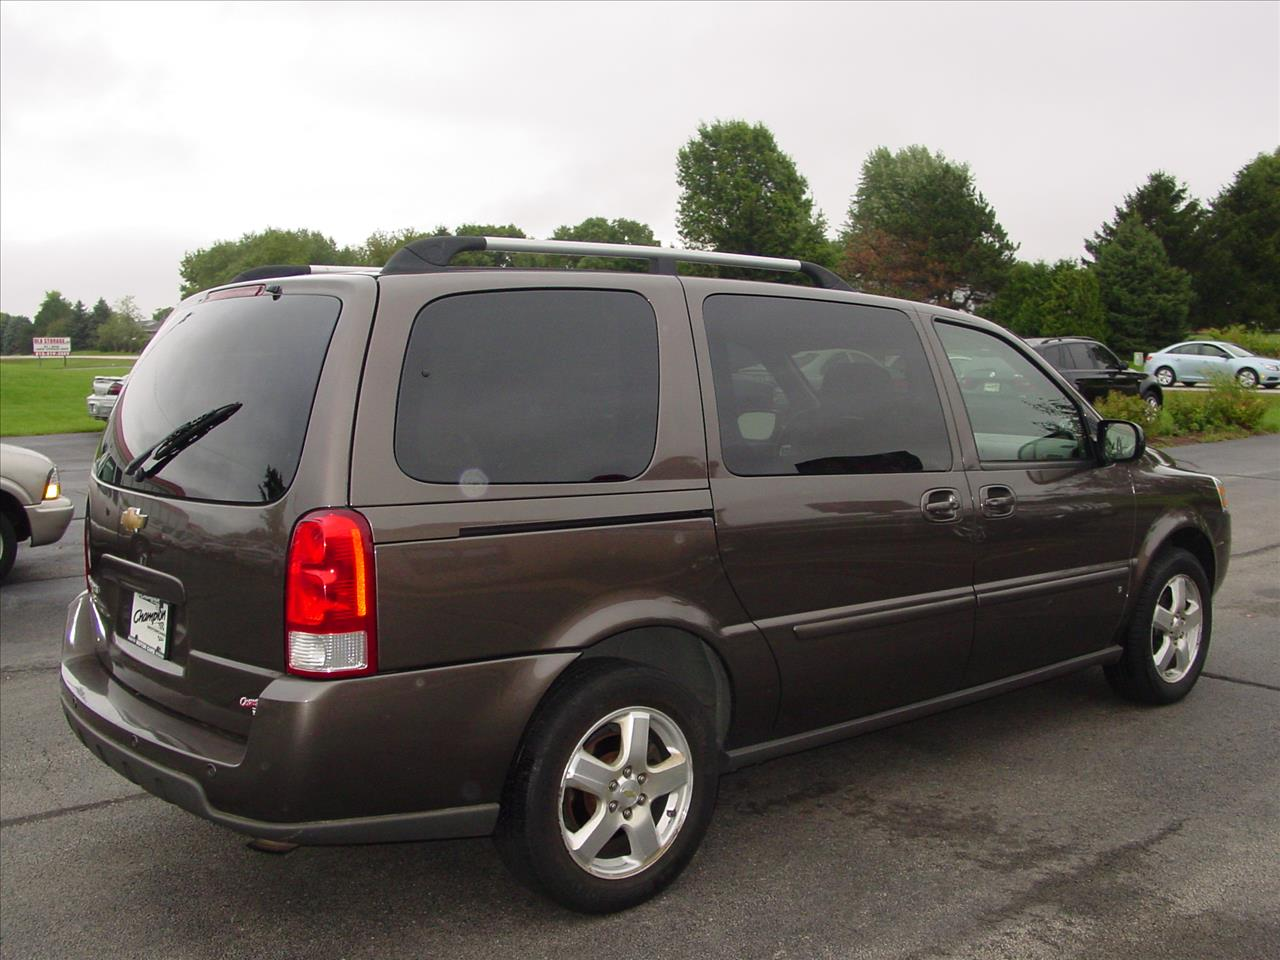 All Chevy 2008 chevy venture van : 2008 Chevrolet Uplander LT 4dr EWB Mini-Van In Machesney Park IL ...